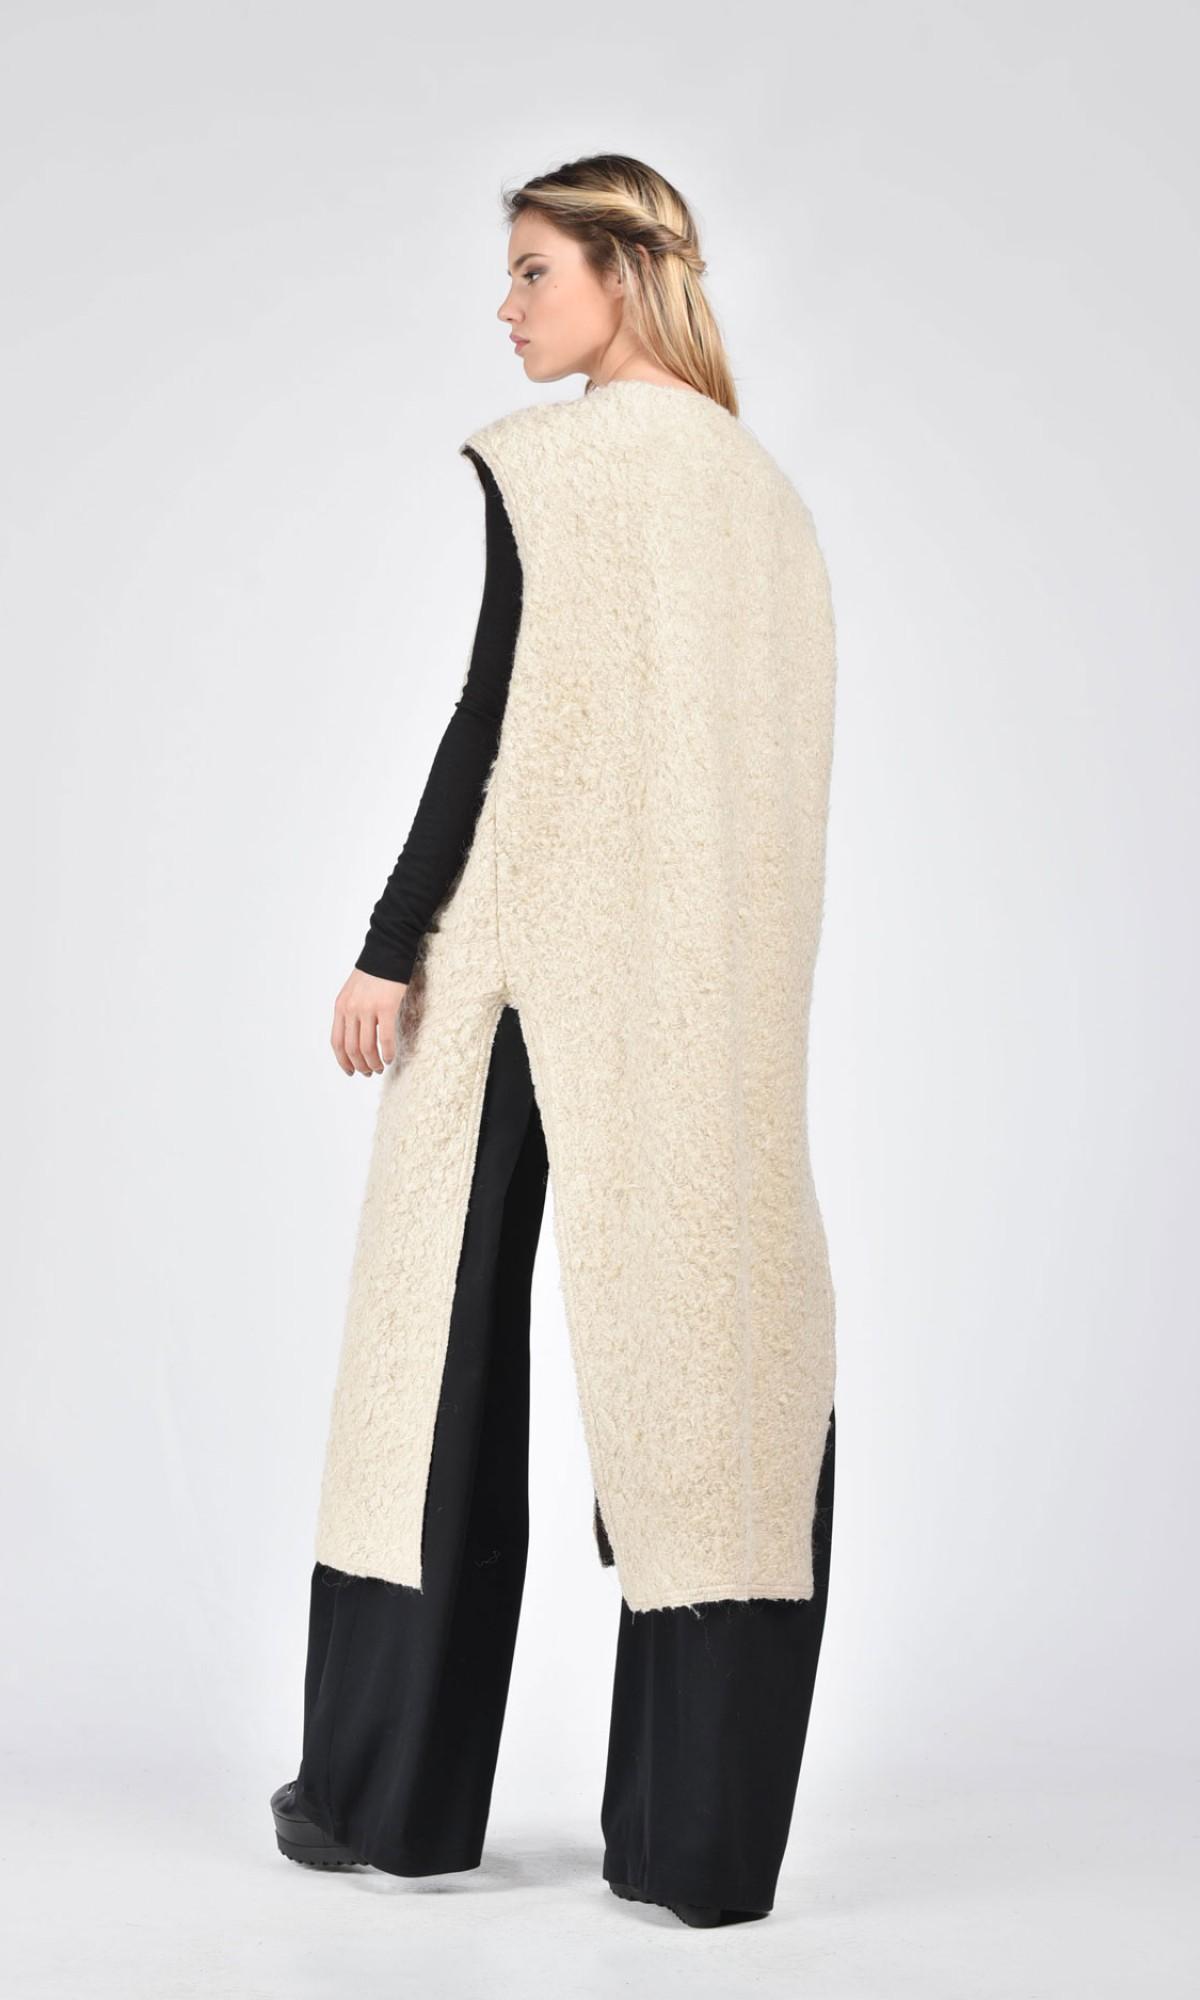 Winter Ivory Wool Sleeveless Vest